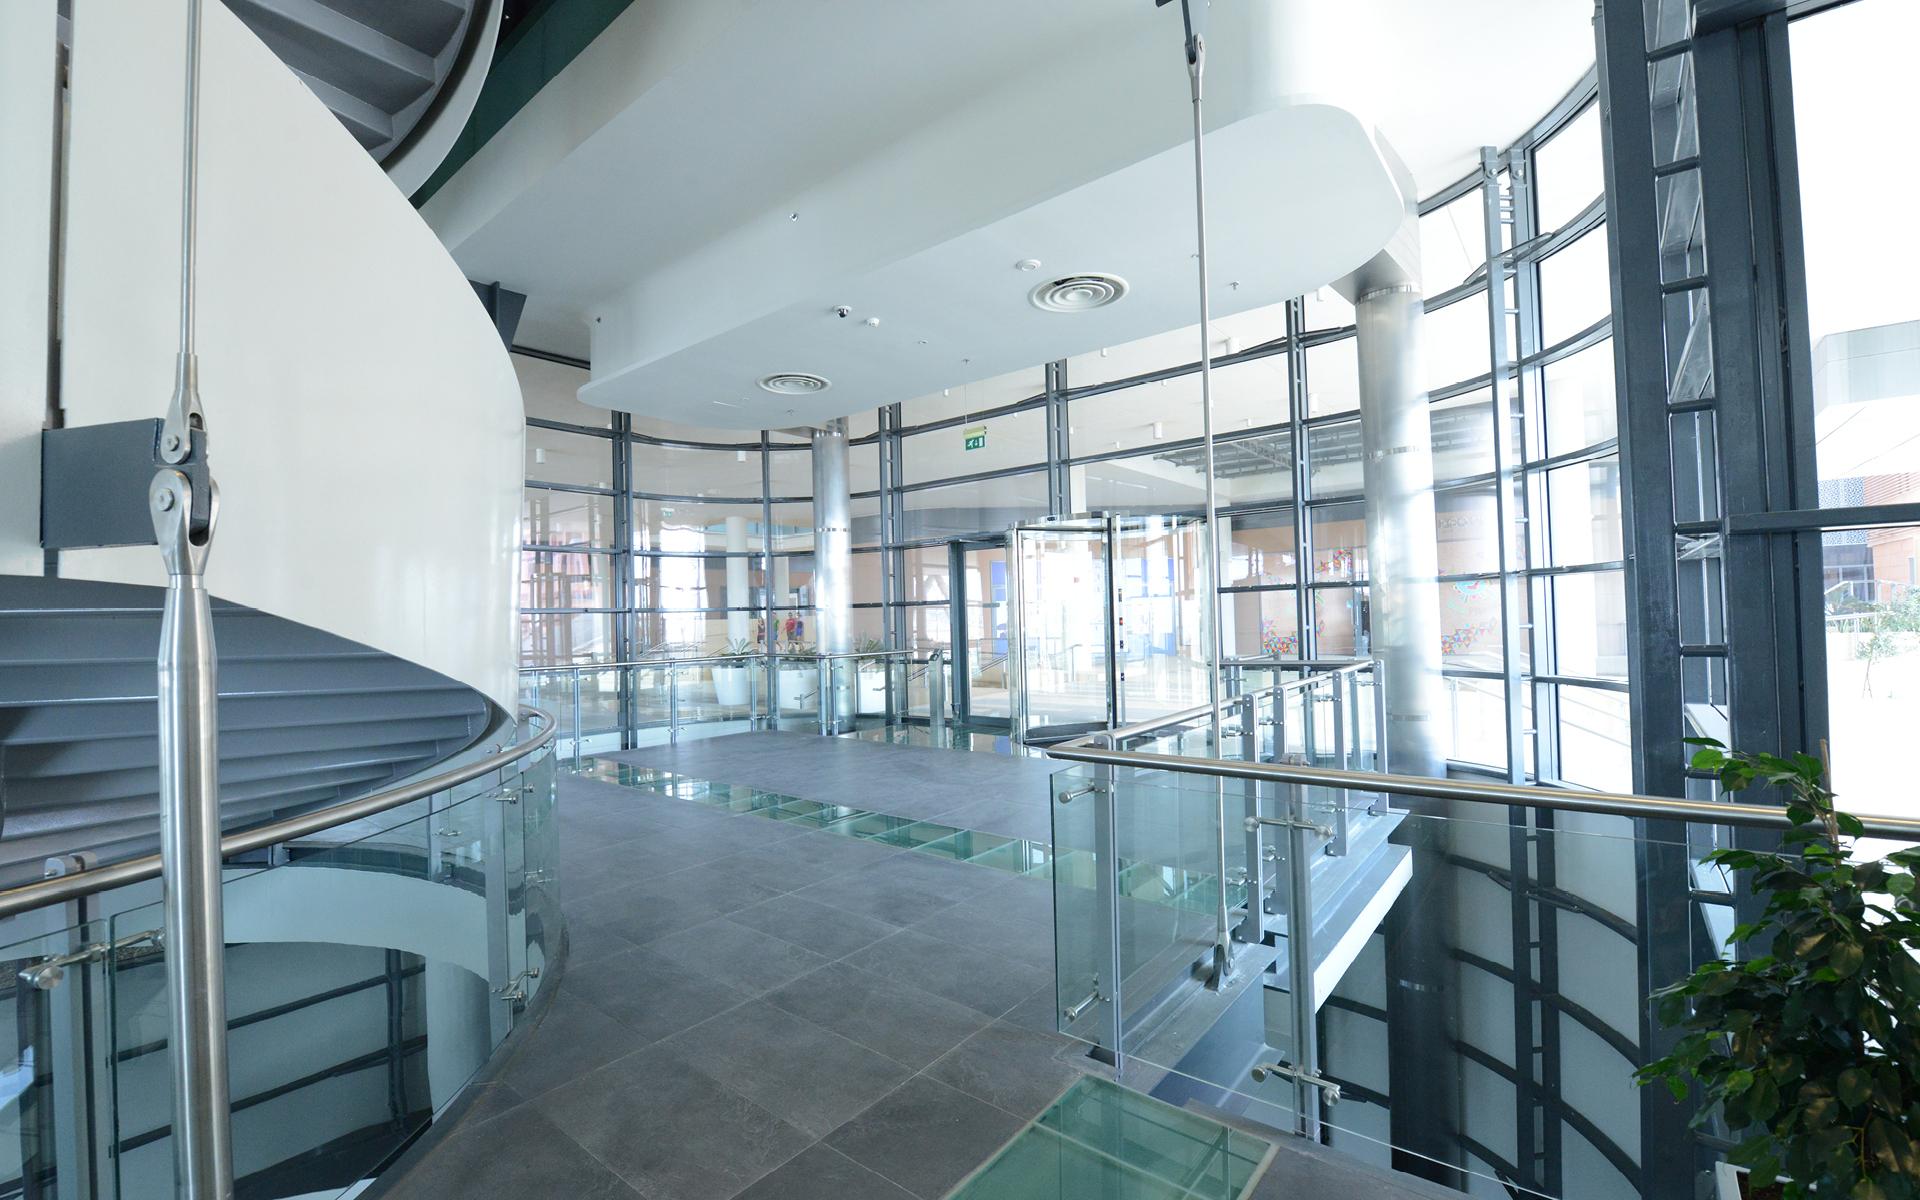 Bluehaus Group | Siemens Masdar City, Abu Dhabi | Bluehaus Group